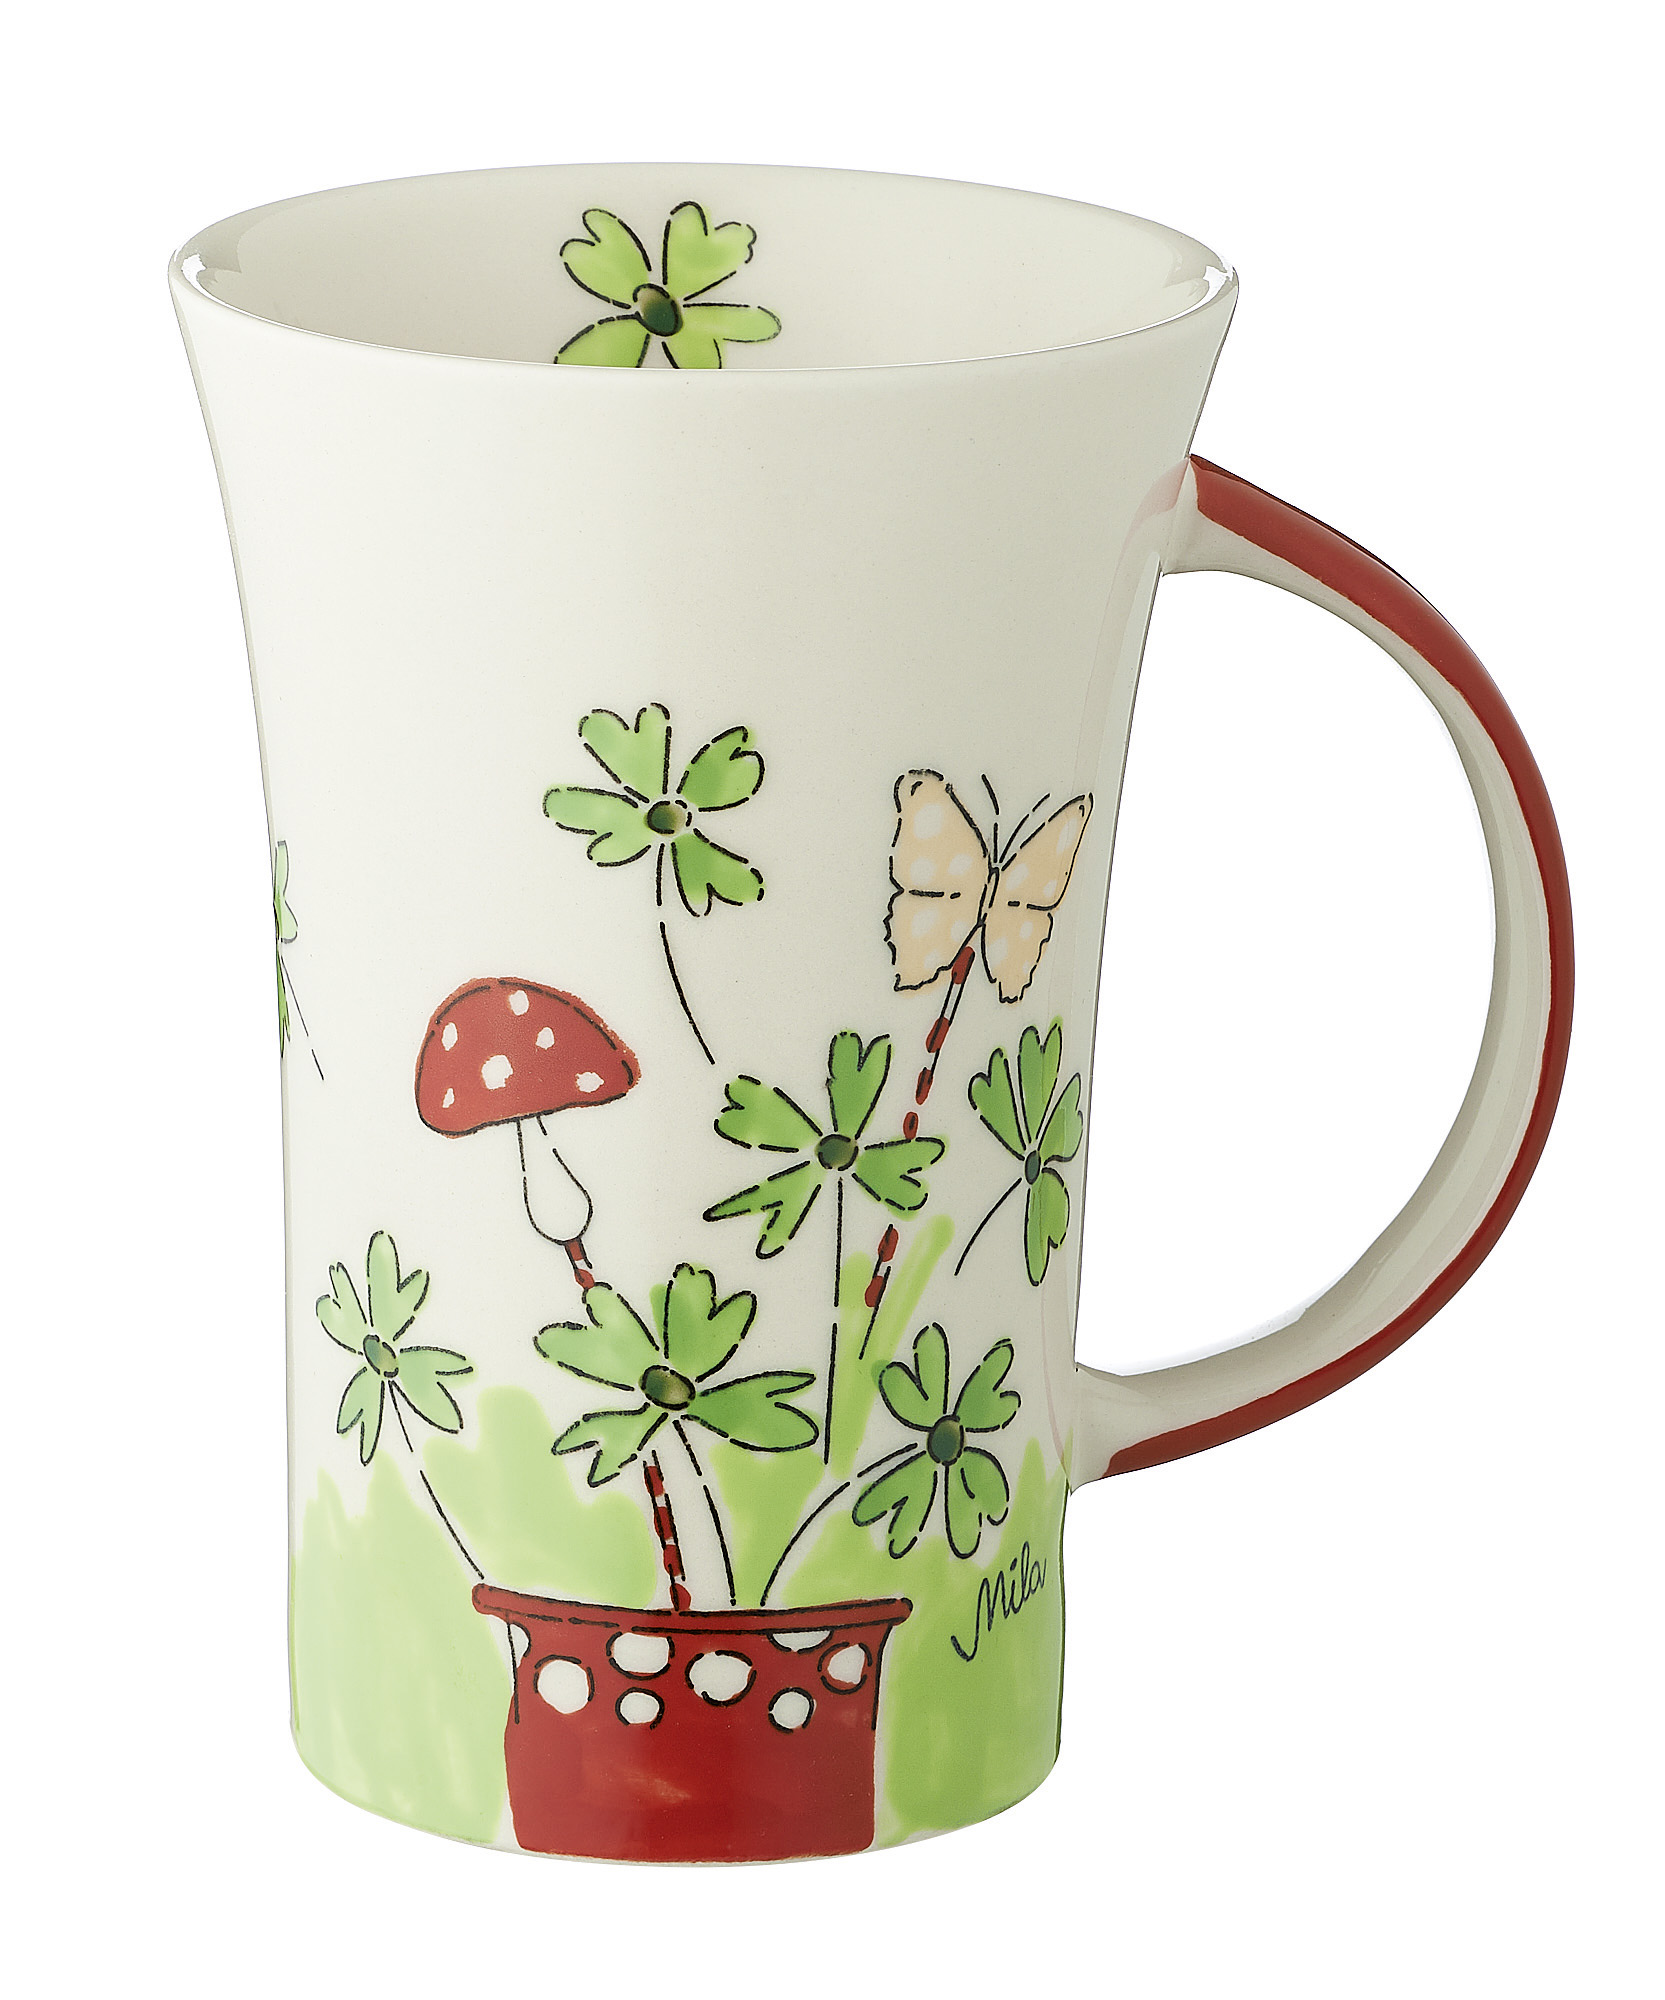 Coffee Pot - Viel Glück